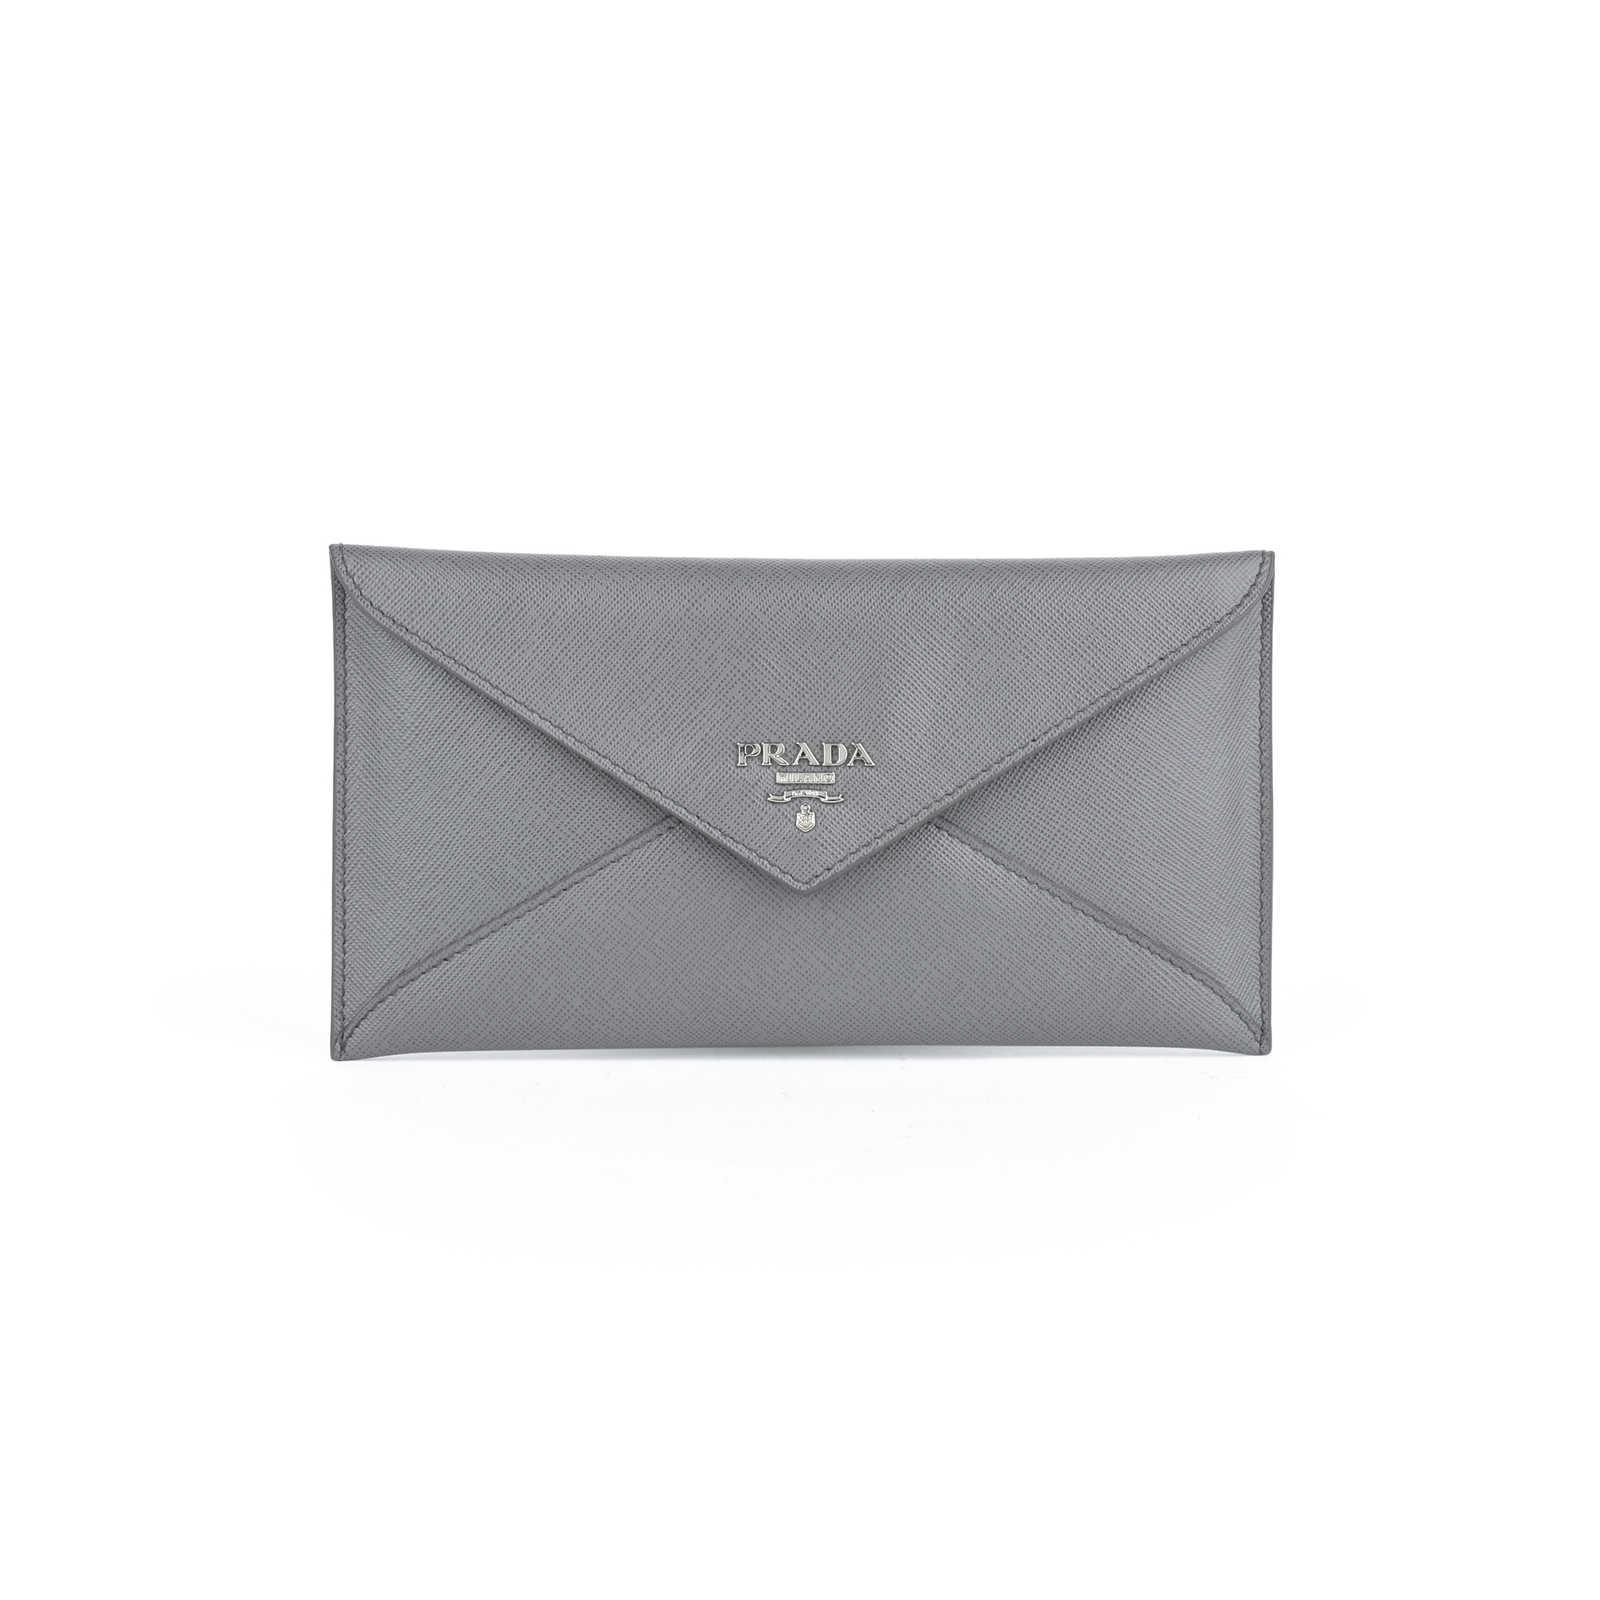 f2ca2fbcc75d01 Authentic Second Hand Prada Envelope Clutch (PSS-424-00016) - Thumbnail 0  ...